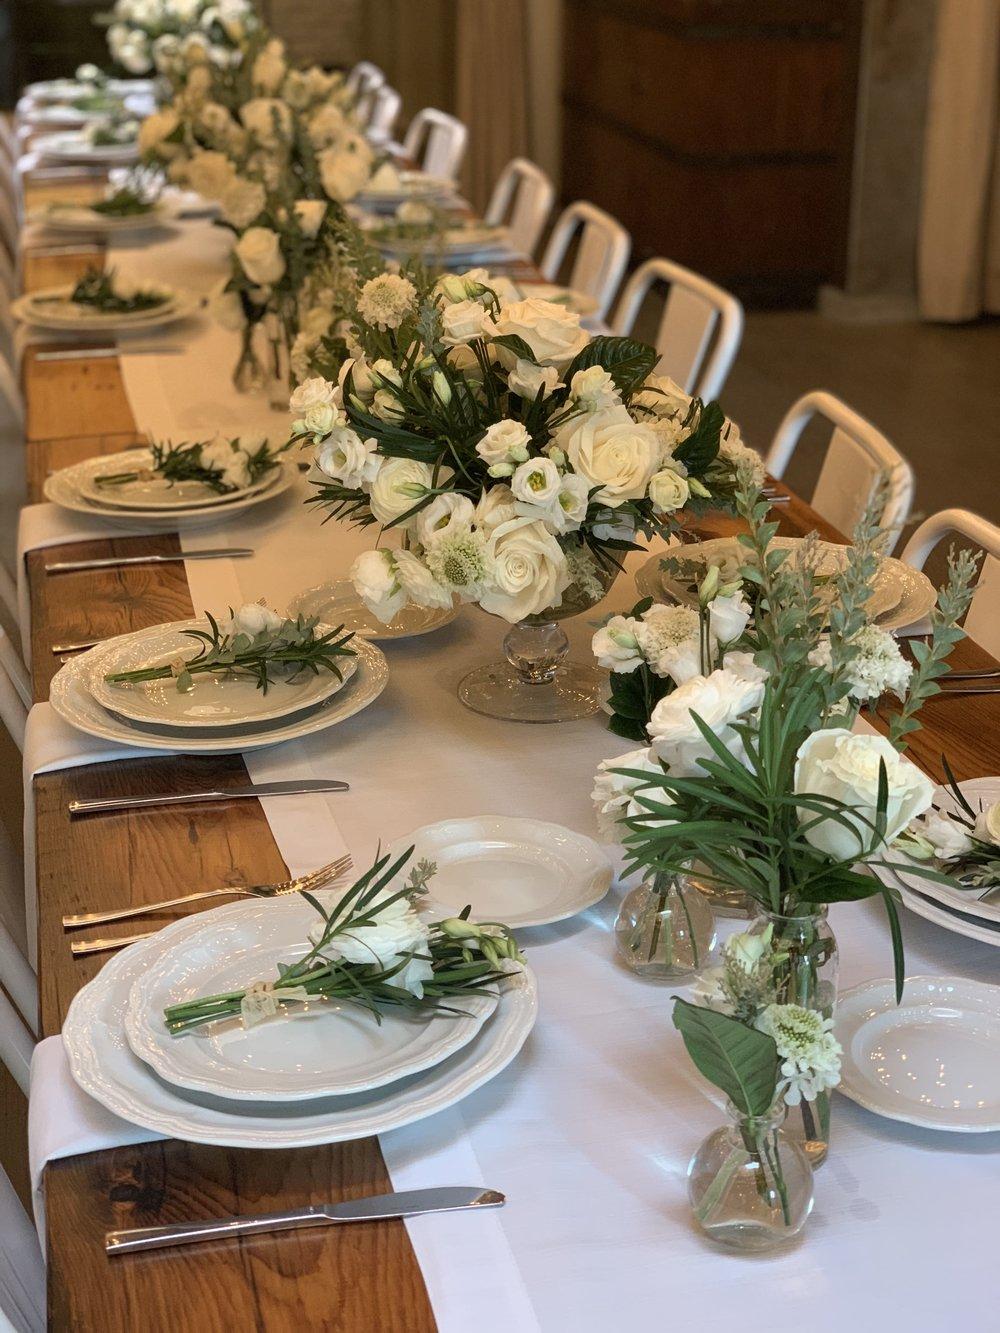 Floral Table Runner- B Floral